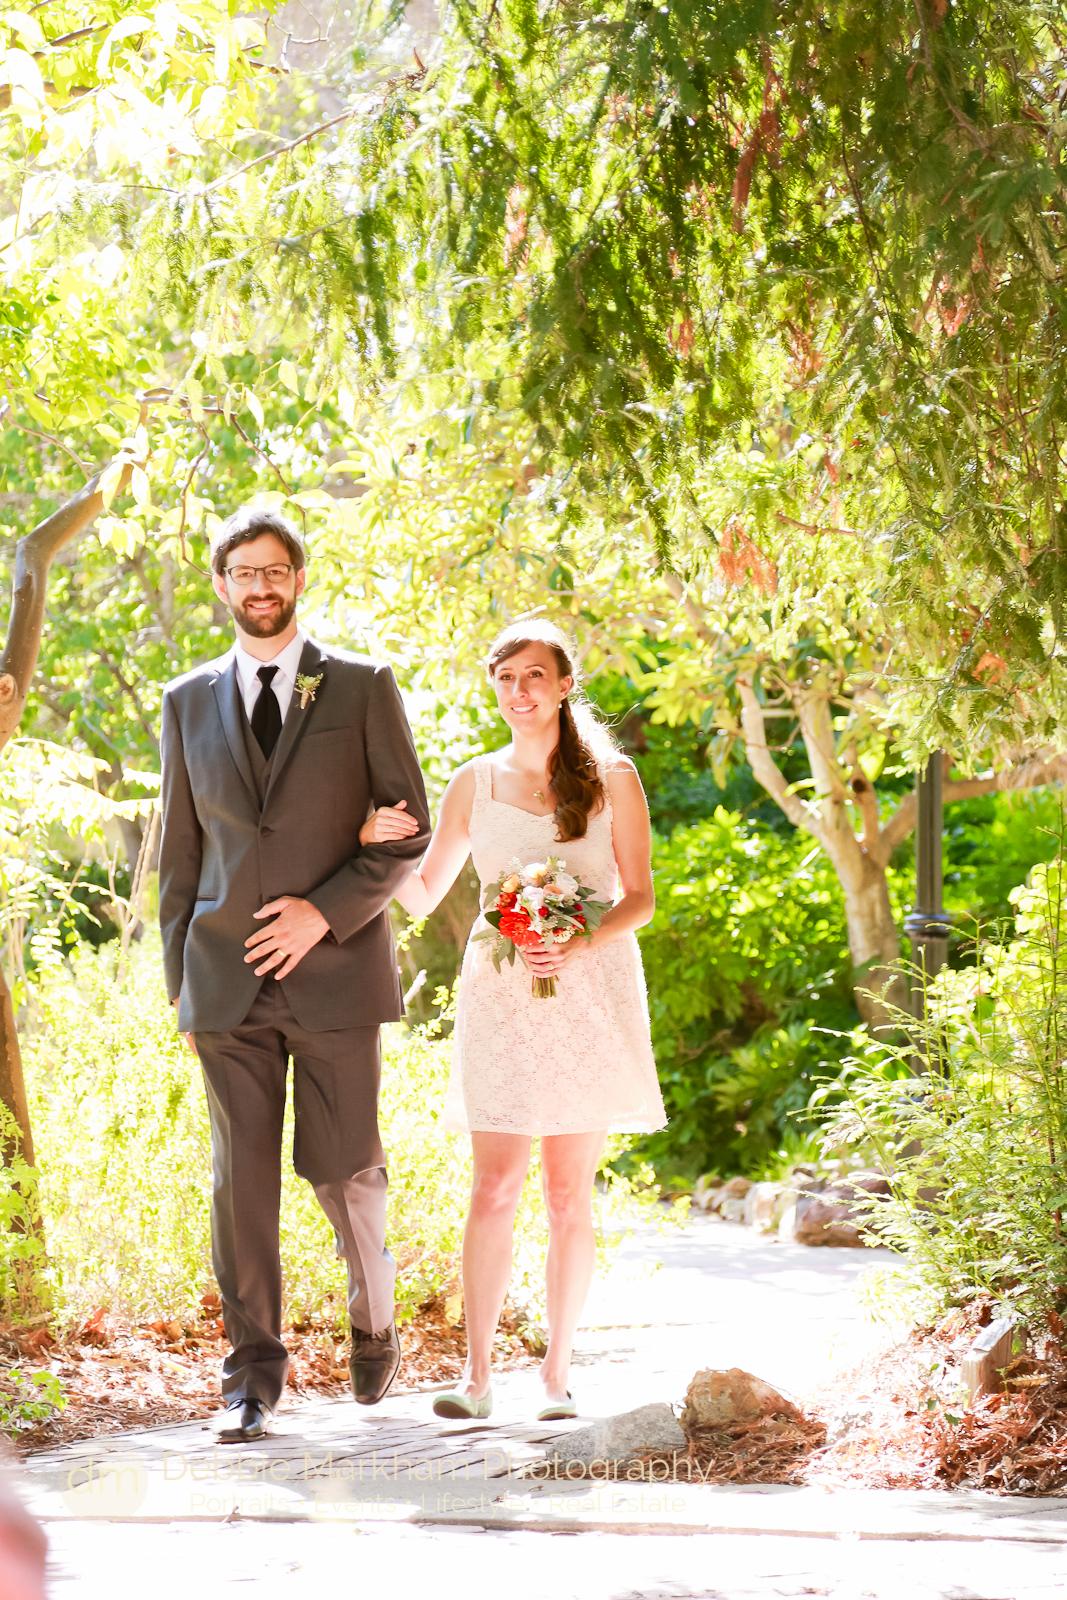 Debbie Markham Photography+Dalliedet House+San Luis Obispo+Garden Wedding+Fall Season-5243